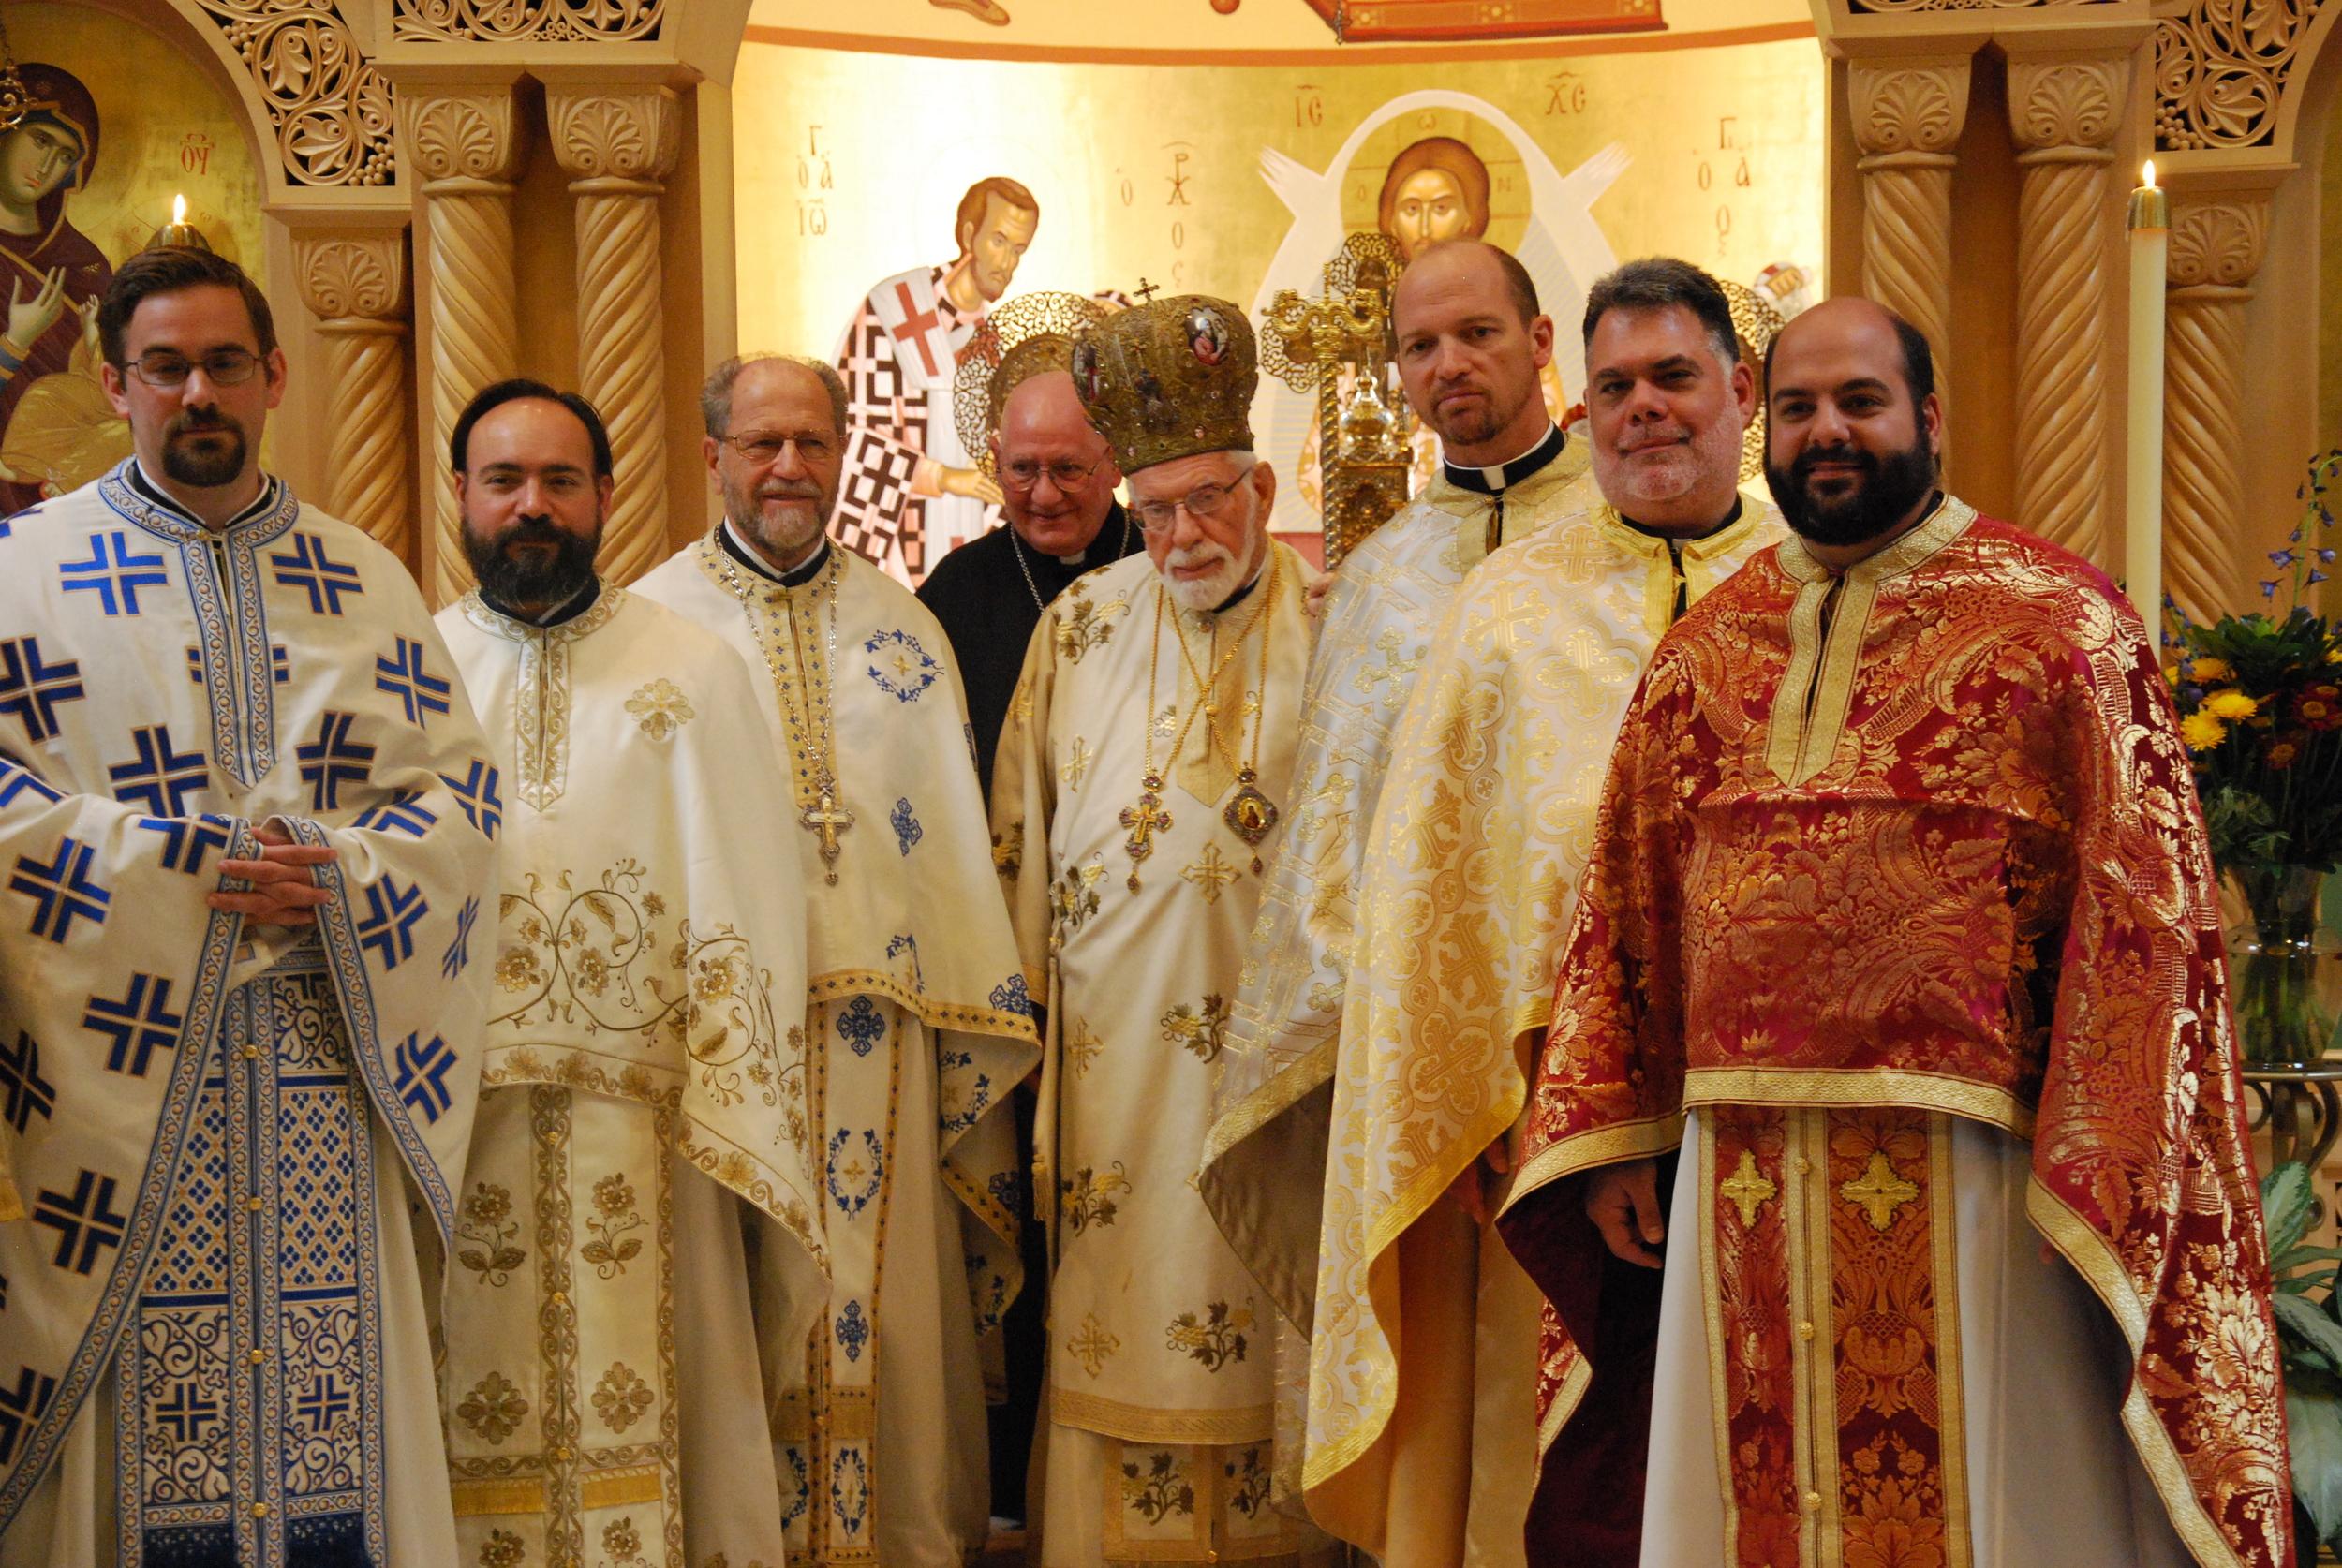 liturgy met iakovos w clergy.JPG